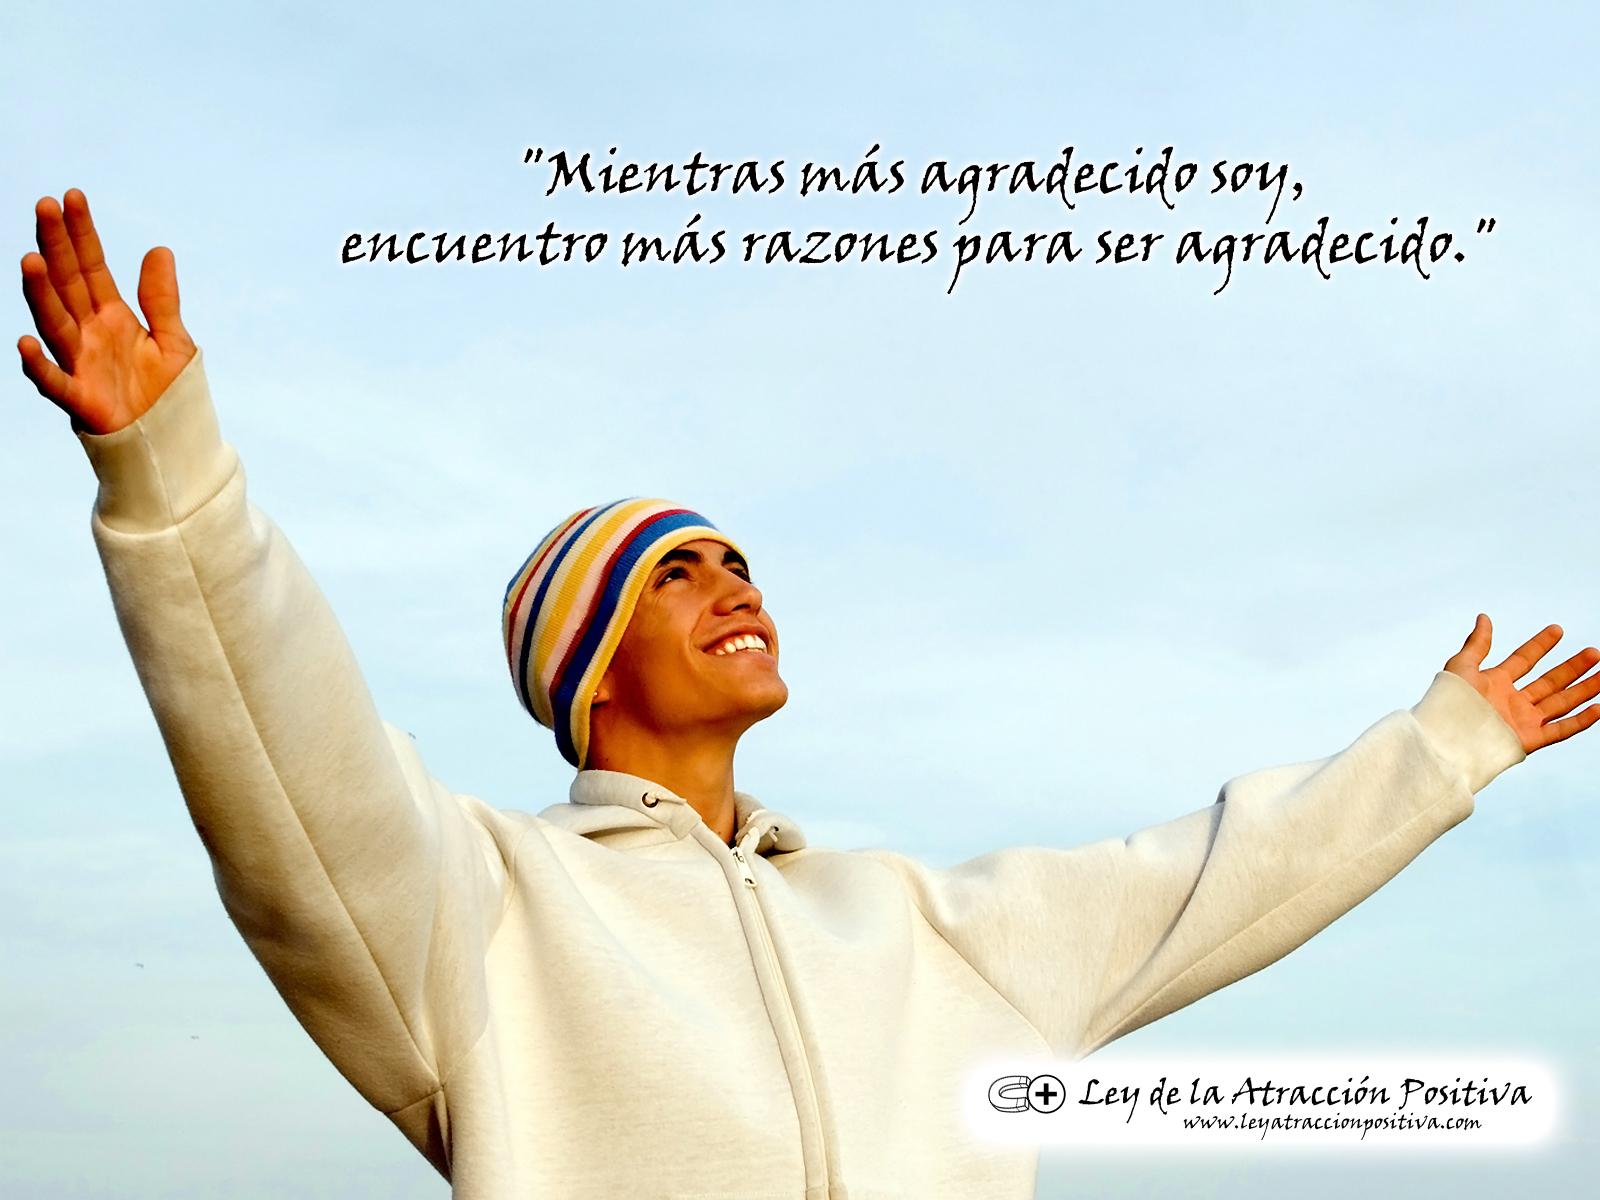 http://1.bp.blogspot.com/-LC4XardY5aQ/TgfkpitkowI/AAAAAAAABzE/OuMAihmuXuU/s1600/Afirmaciones-Decretos-El-Secreto-Ley-de-Atraccion-Positiva-06.jpg